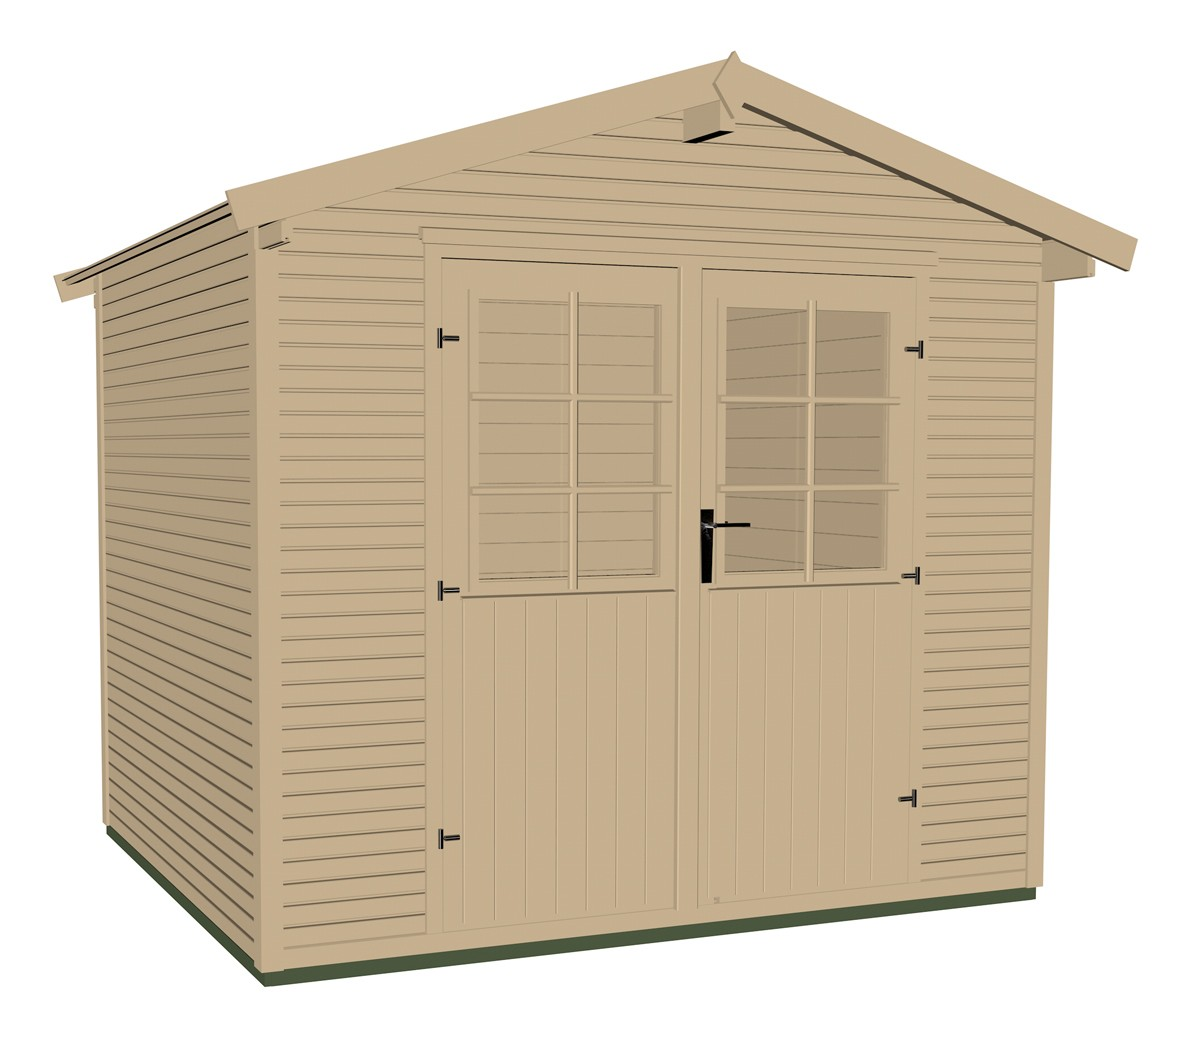 ger tehaus holz 28mm weka gartenhaus 218 gr 2 natur 320x235cm bei. Black Bedroom Furniture Sets. Home Design Ideas